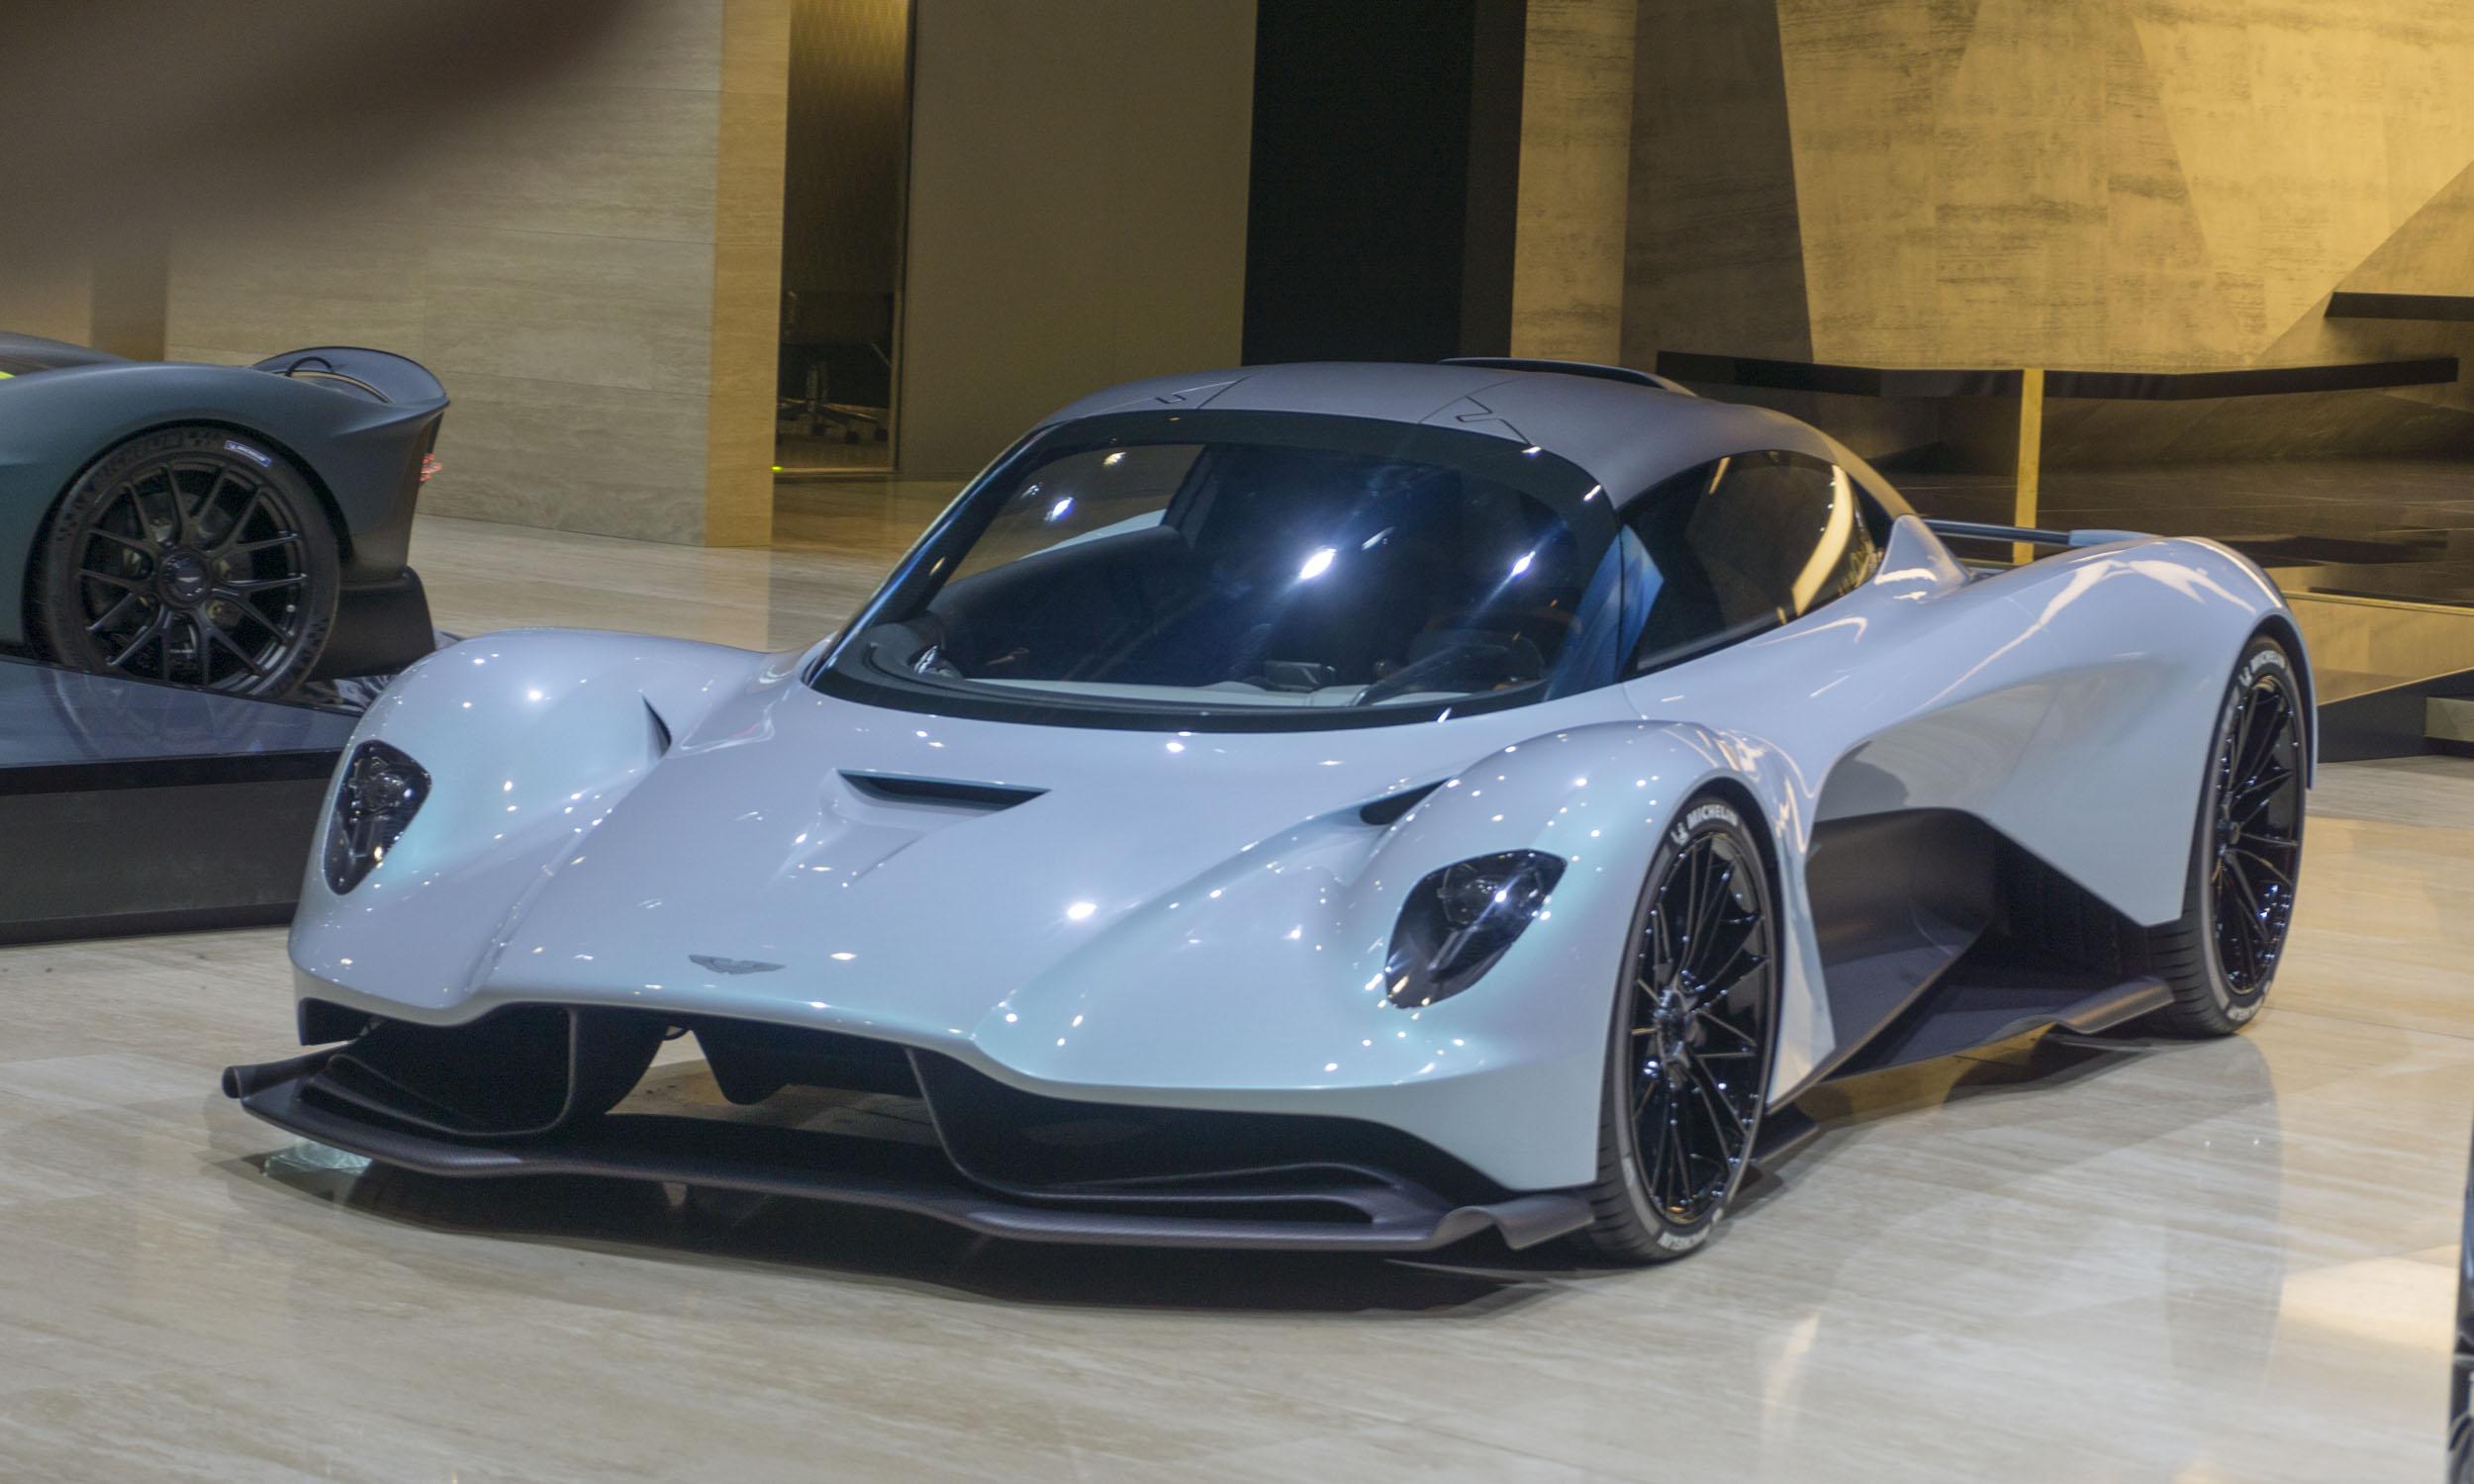 2019 Geneva Motor Show: Aston Martin AM-RB 003